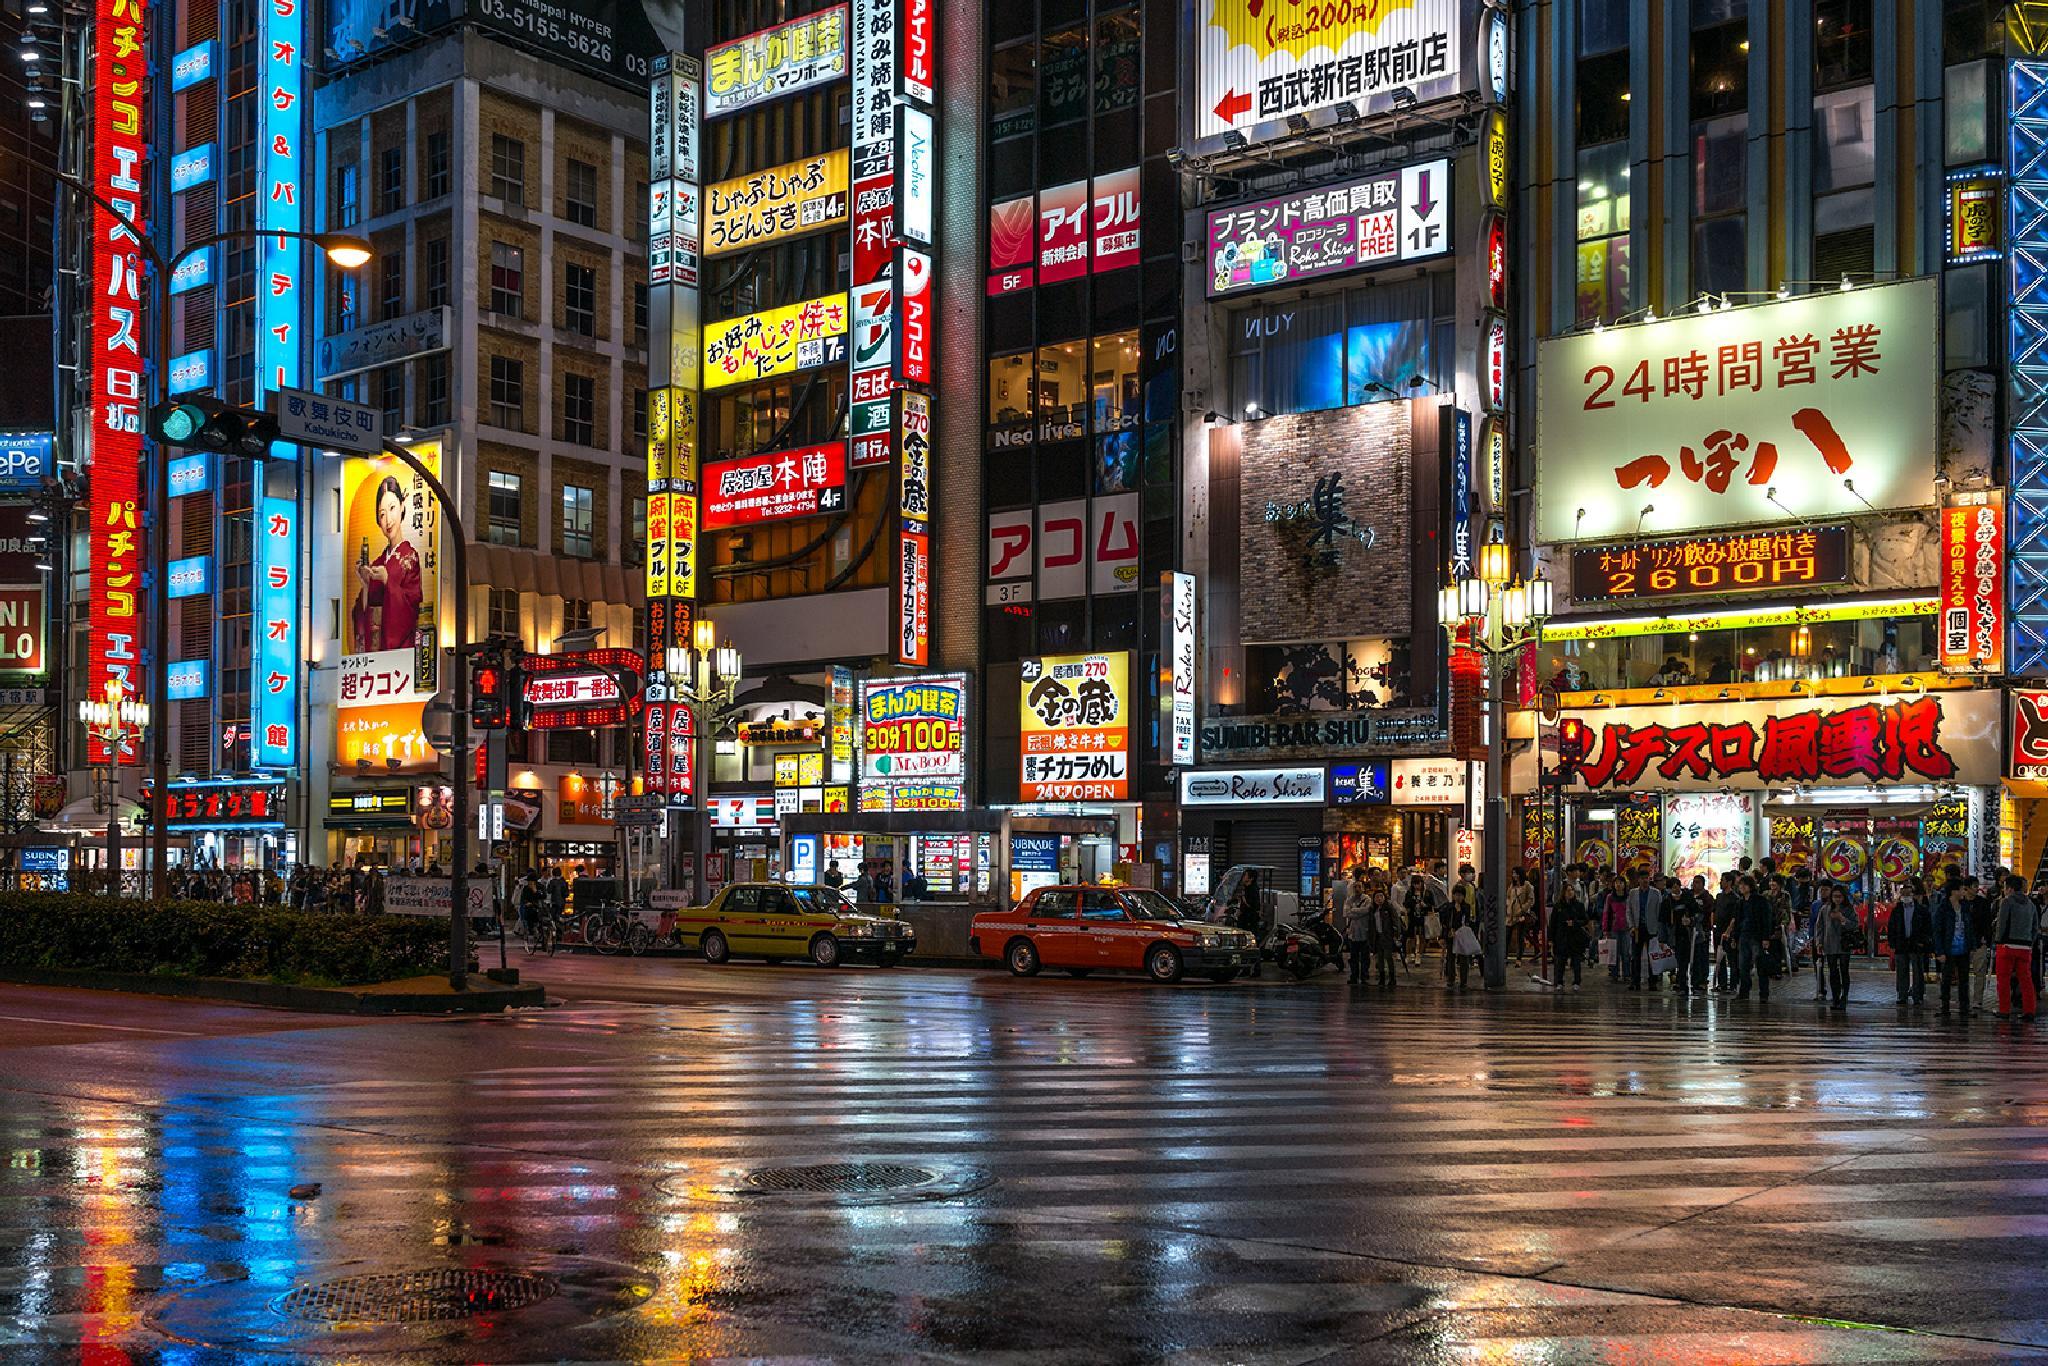 Tokyo at night by Ana Gomez